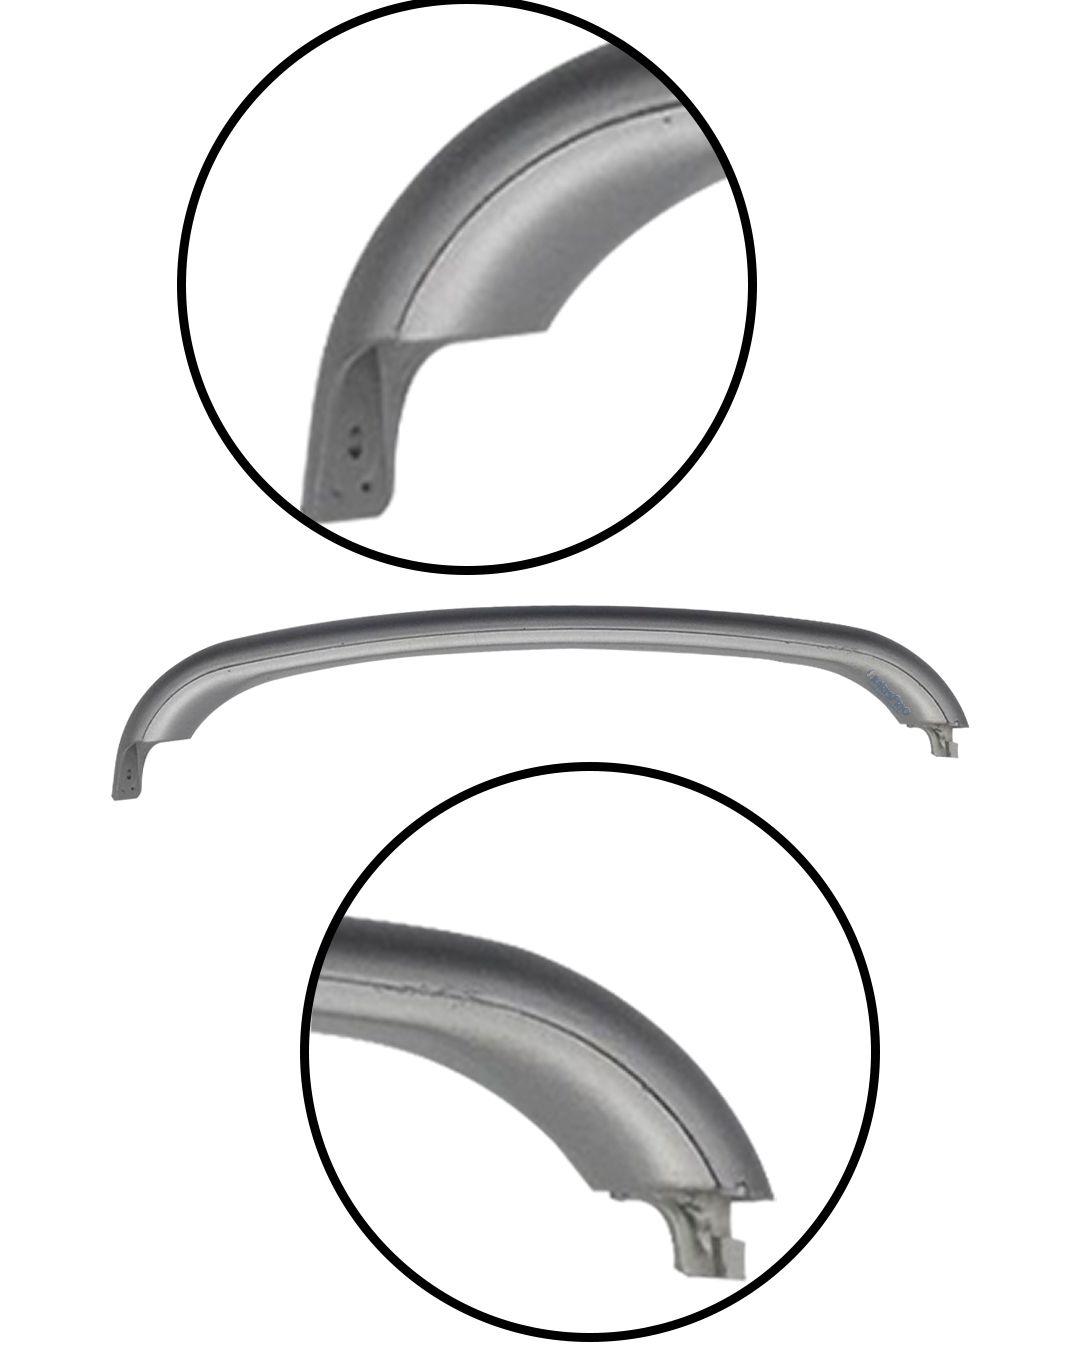 Puxador Horizontal Prata Refrigerador - Bosch Continental